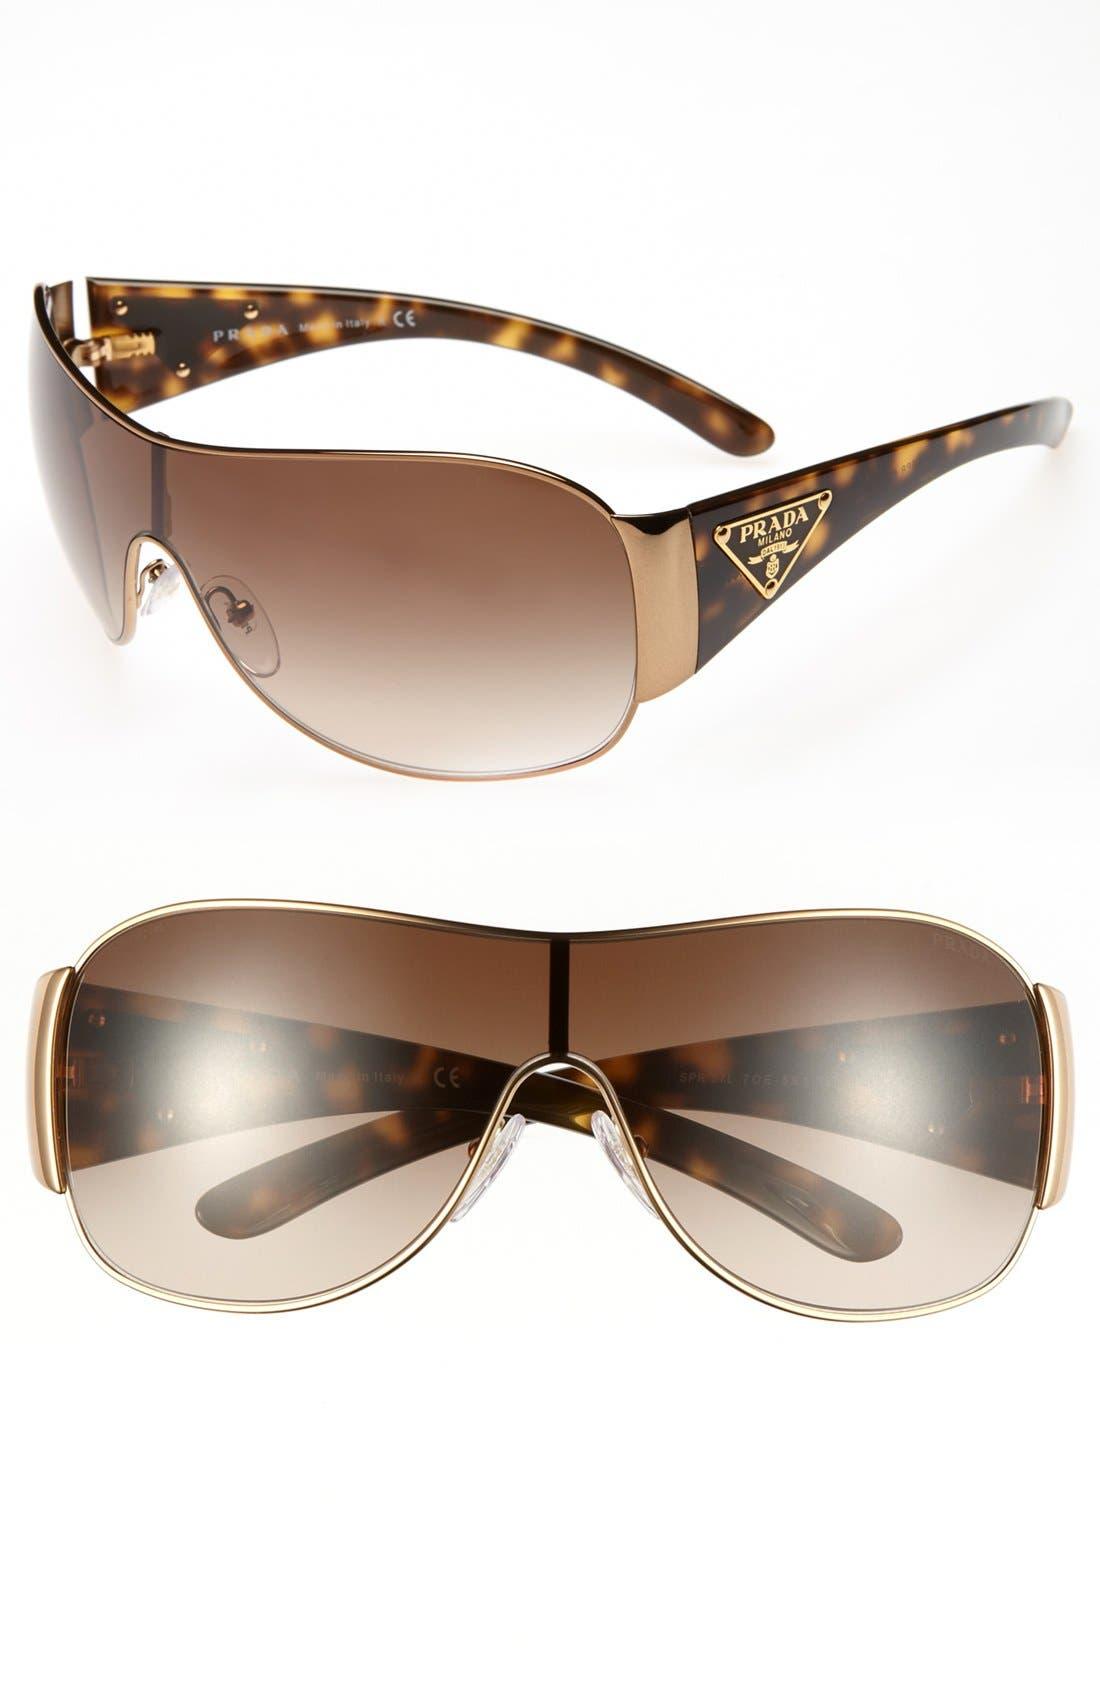 Alternate Image 1 Selected - Prada 'C-Shield' Polarized Sunglasses